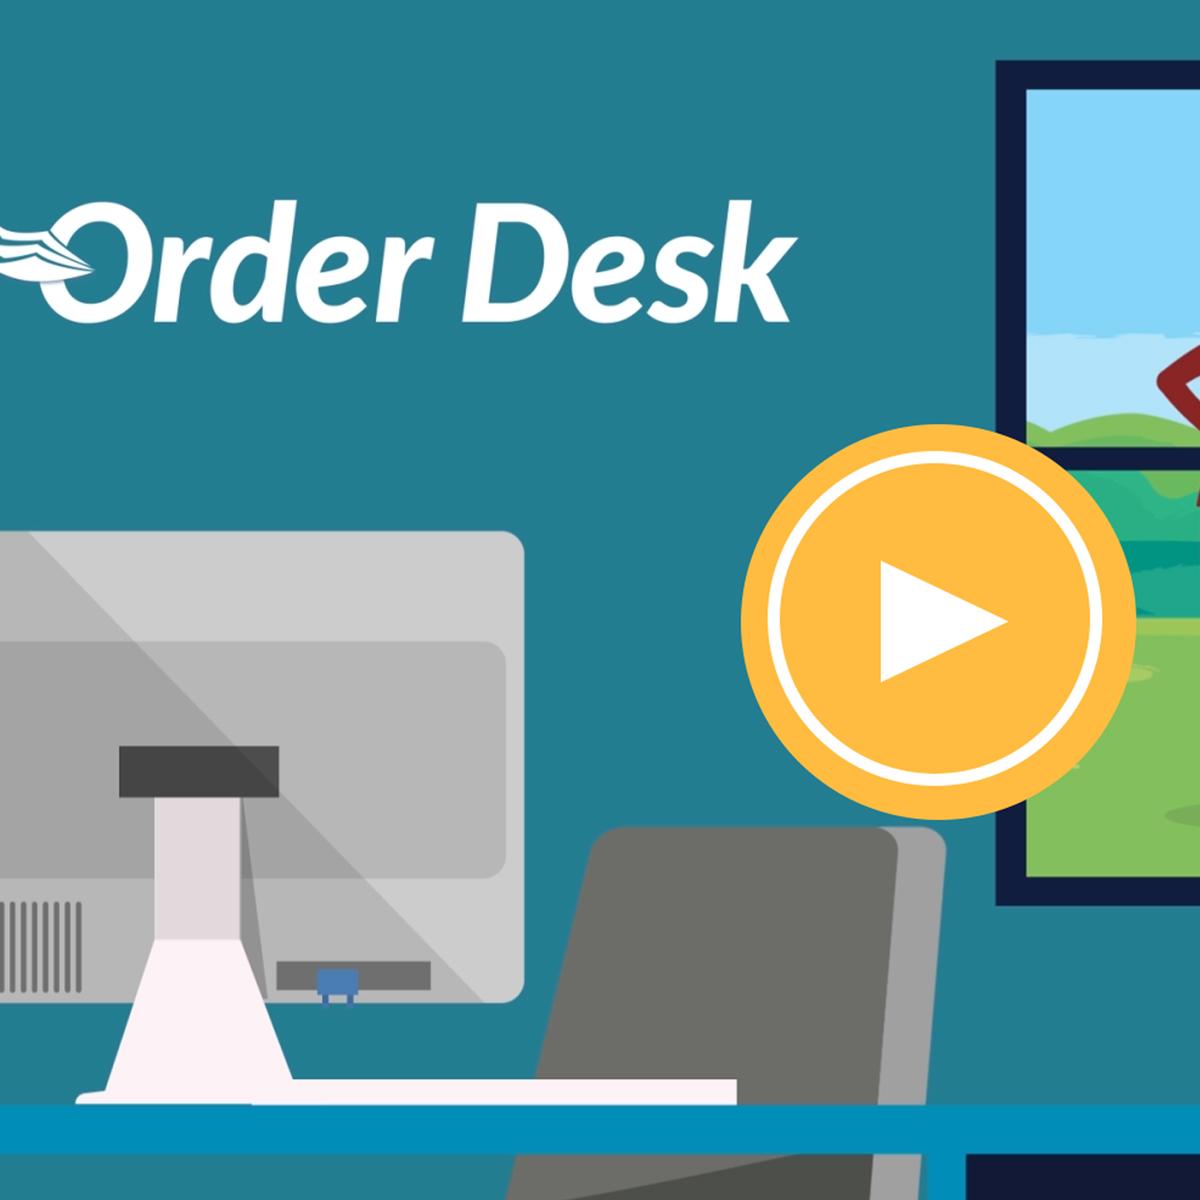 CustomCat partners with Order Desk